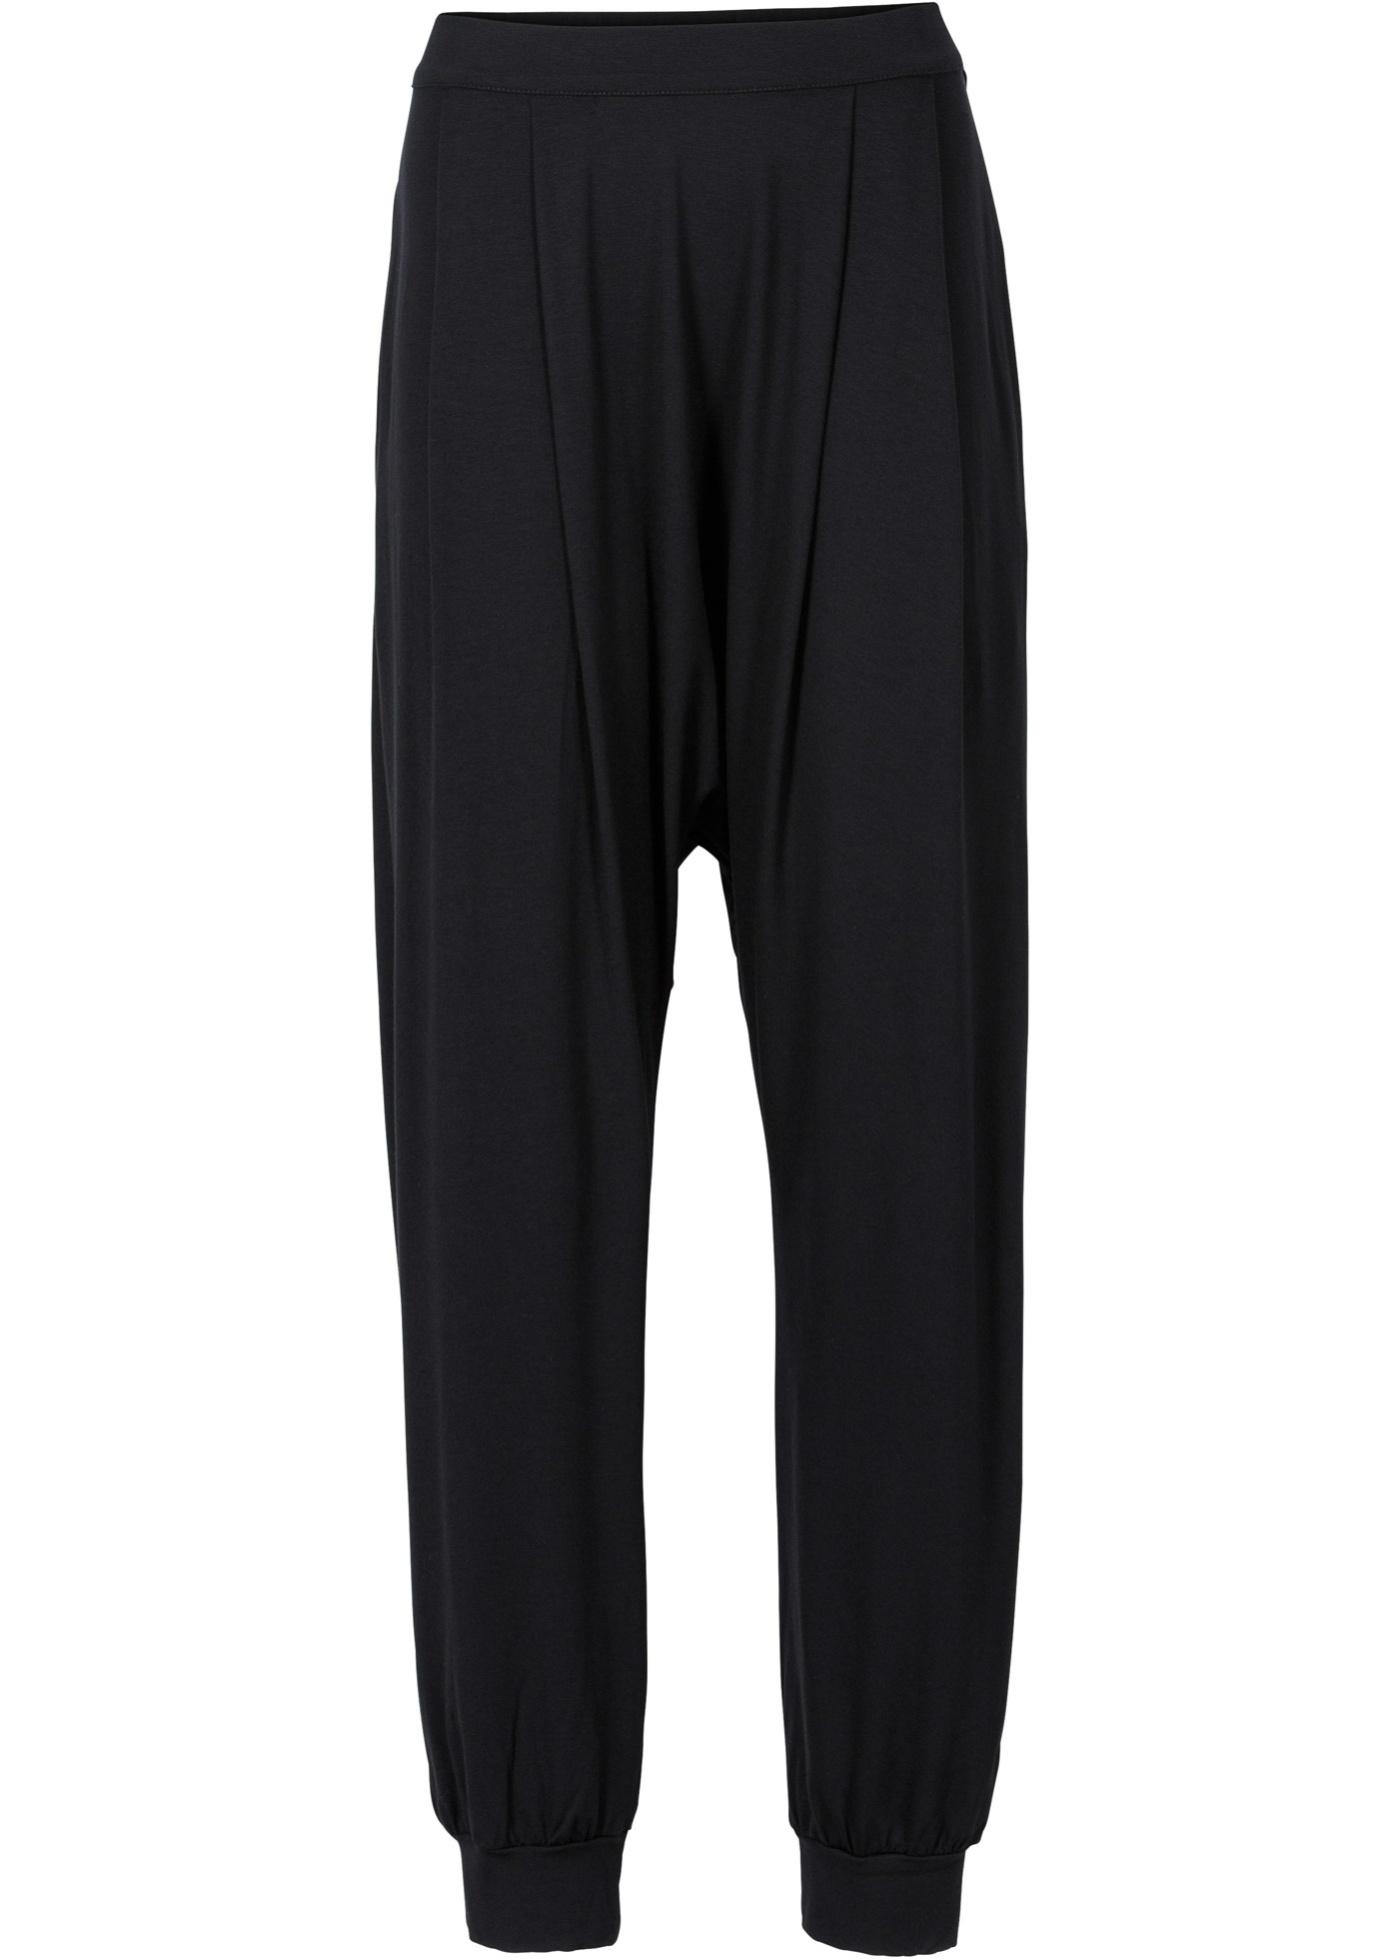 Pantalon sarouel noir femme - bonprix